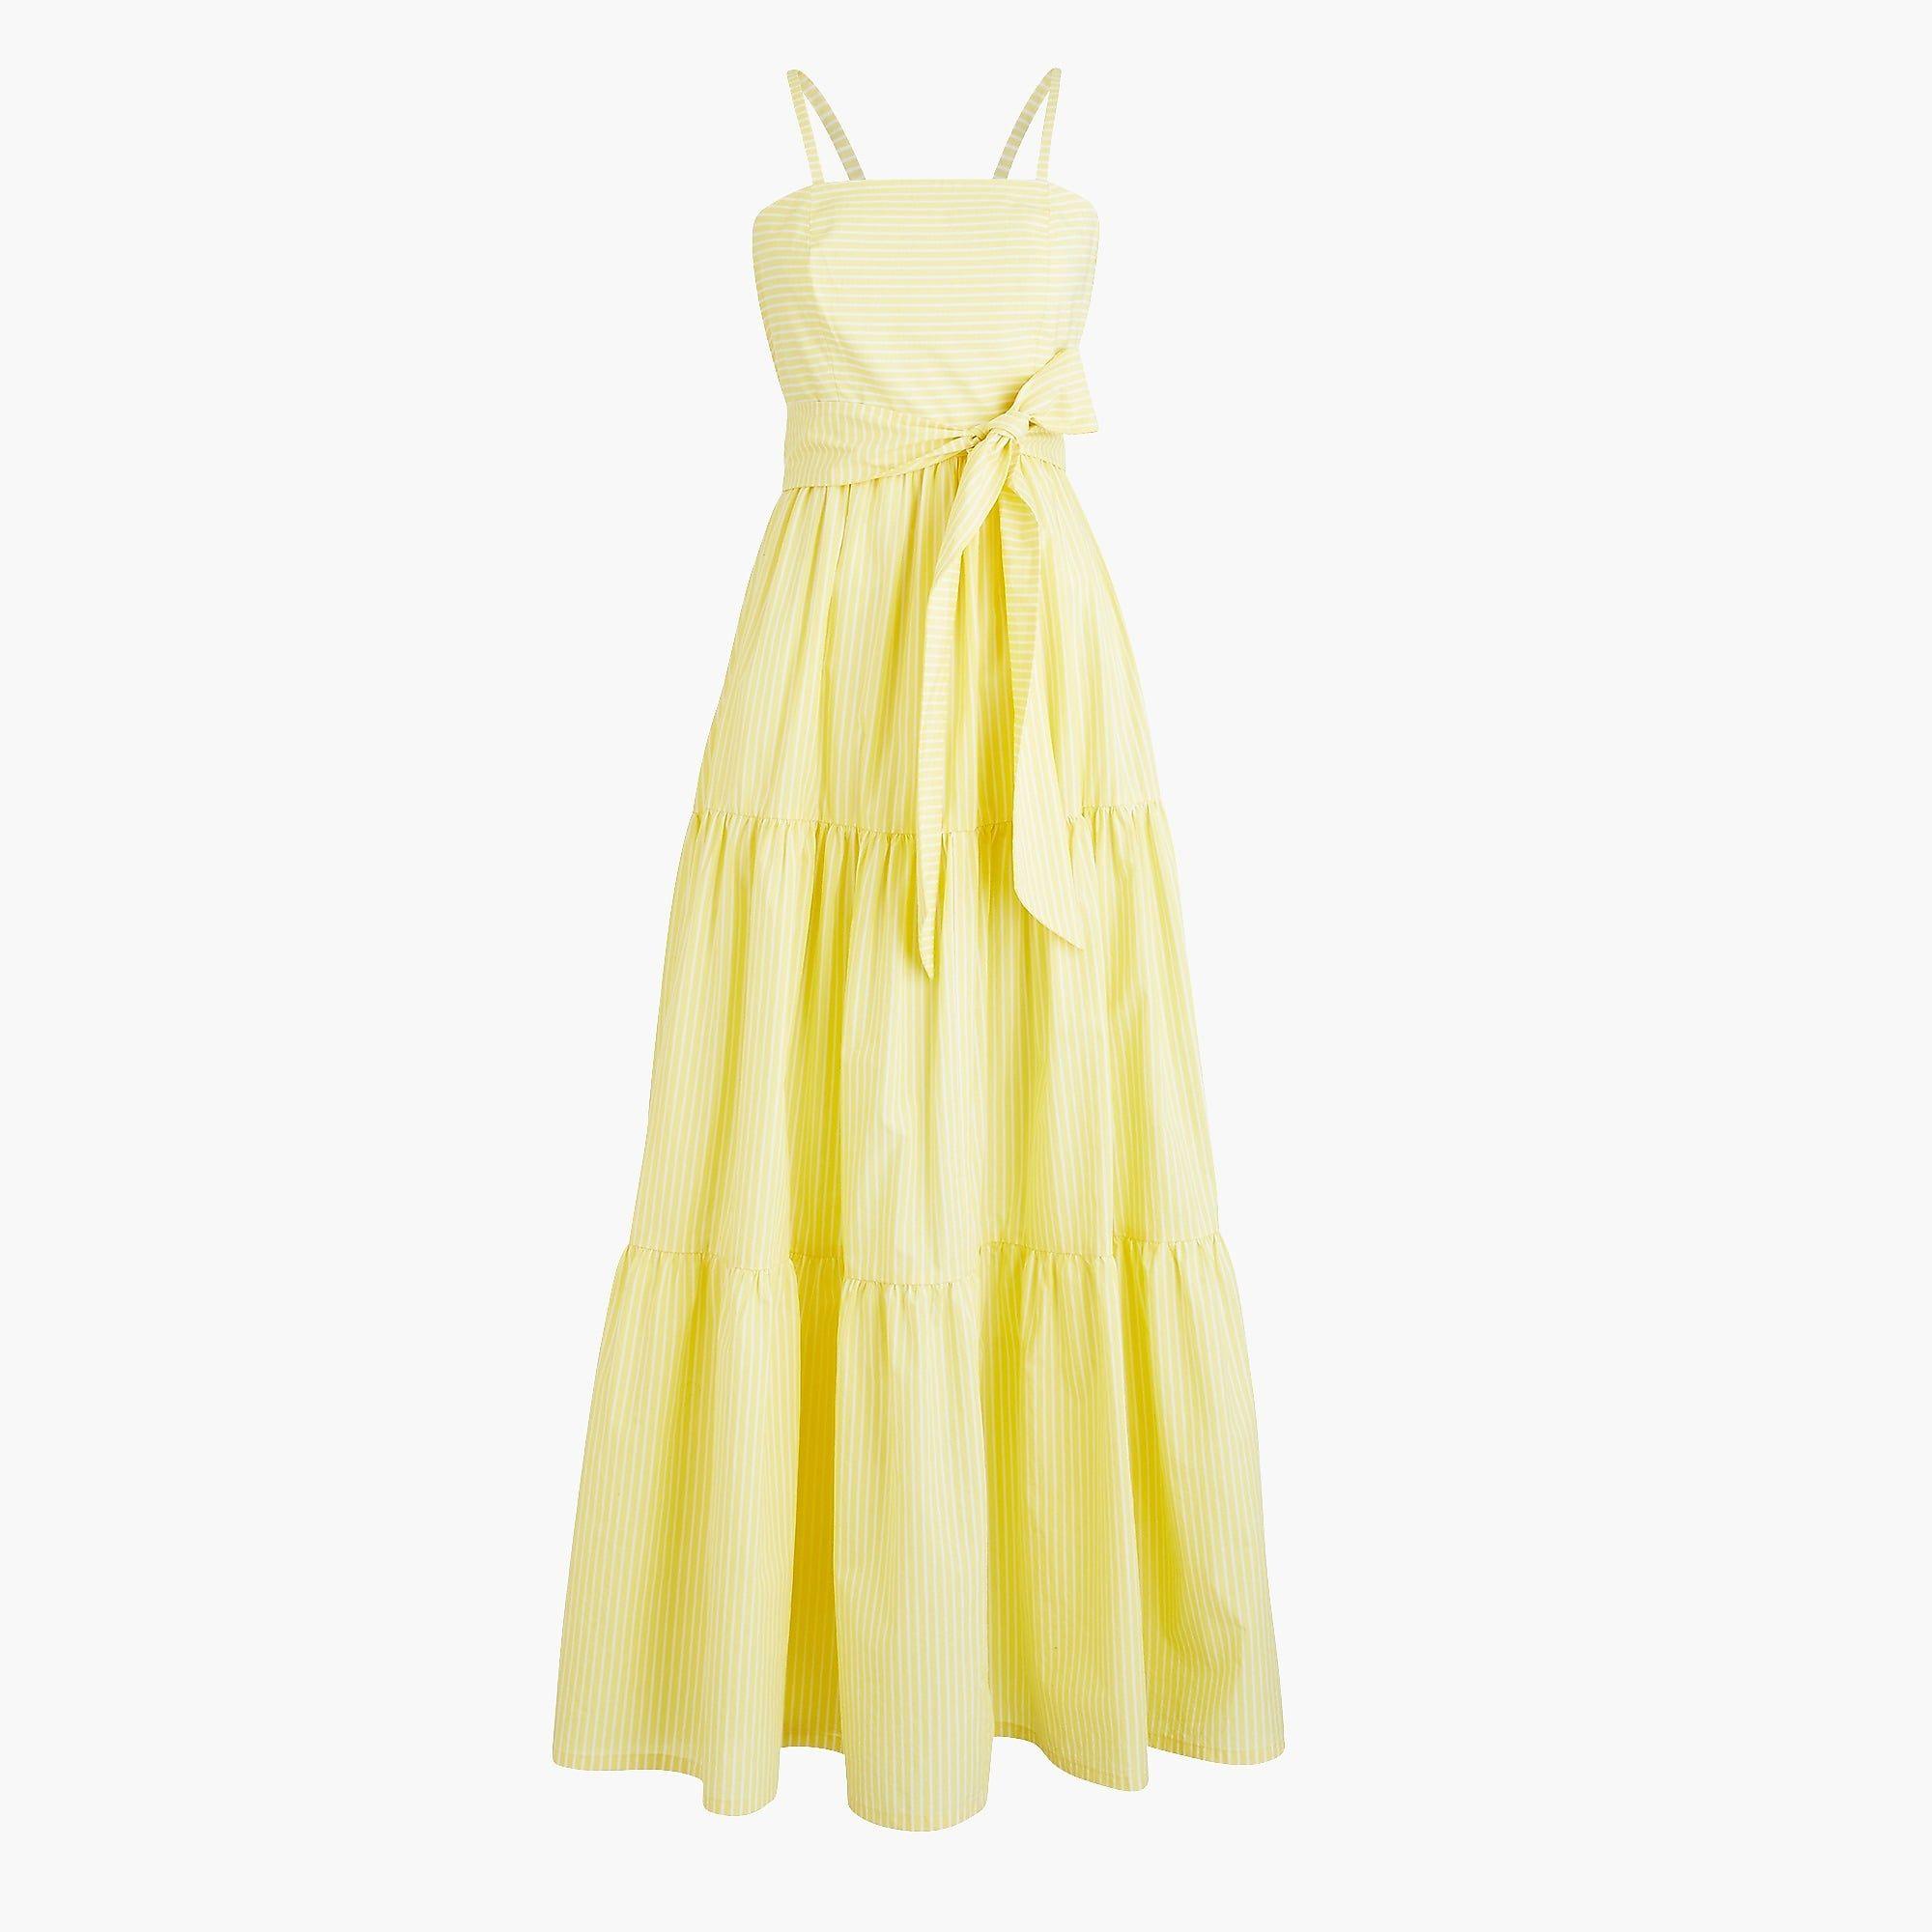 8f5dd40c5 J.Crew - Tiered maxi dress in stripe | My Style | Dresses, Summer ...